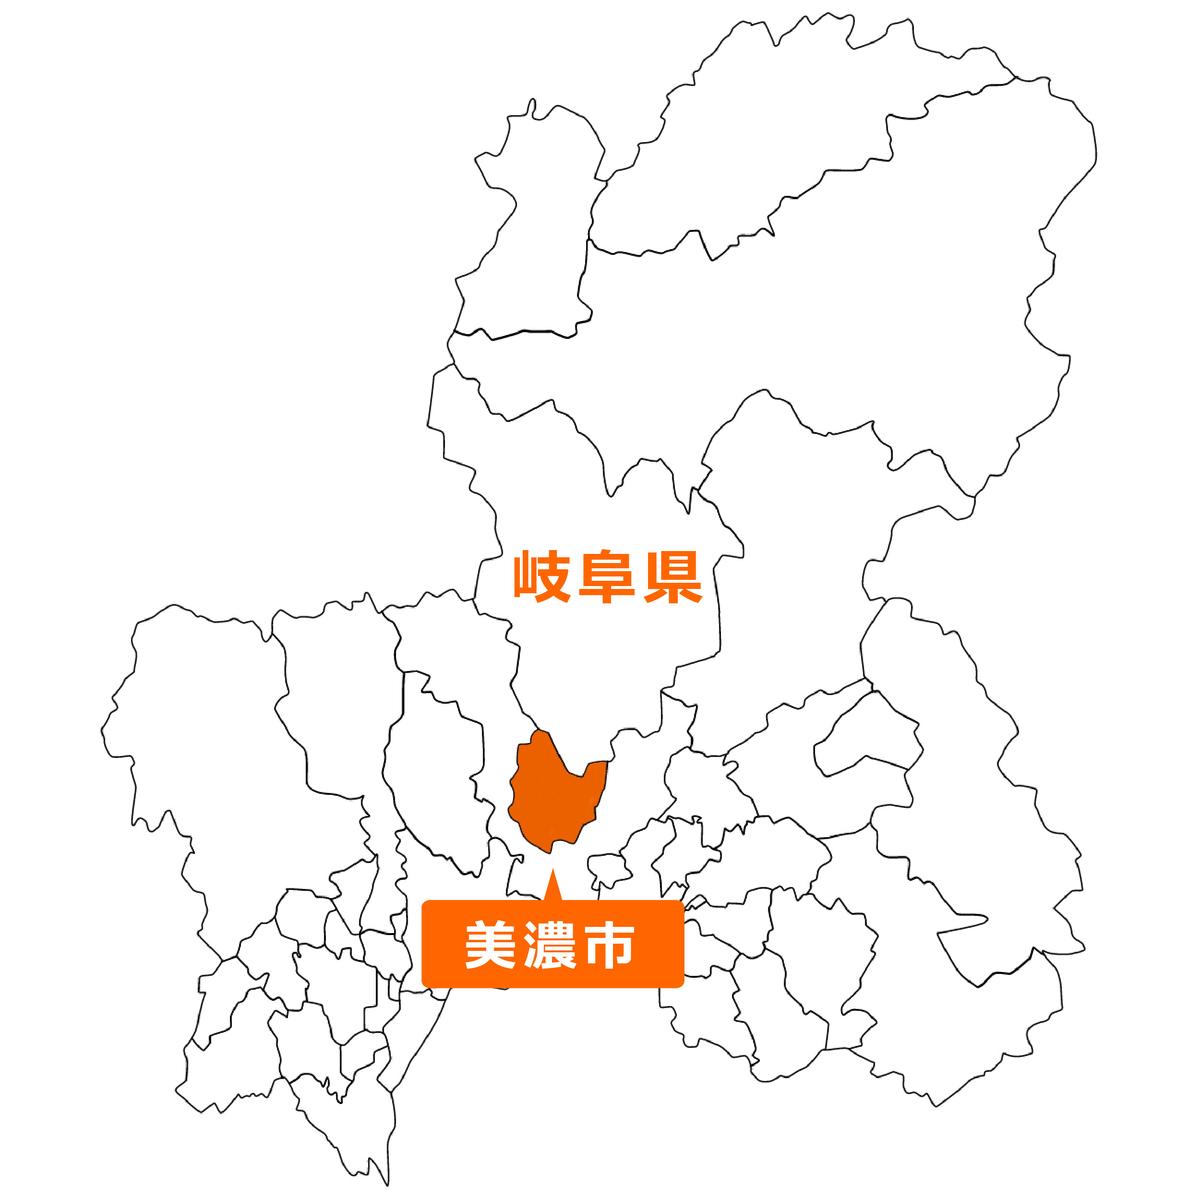 f:id:gk-murai33-gk:20210119193017j:plain